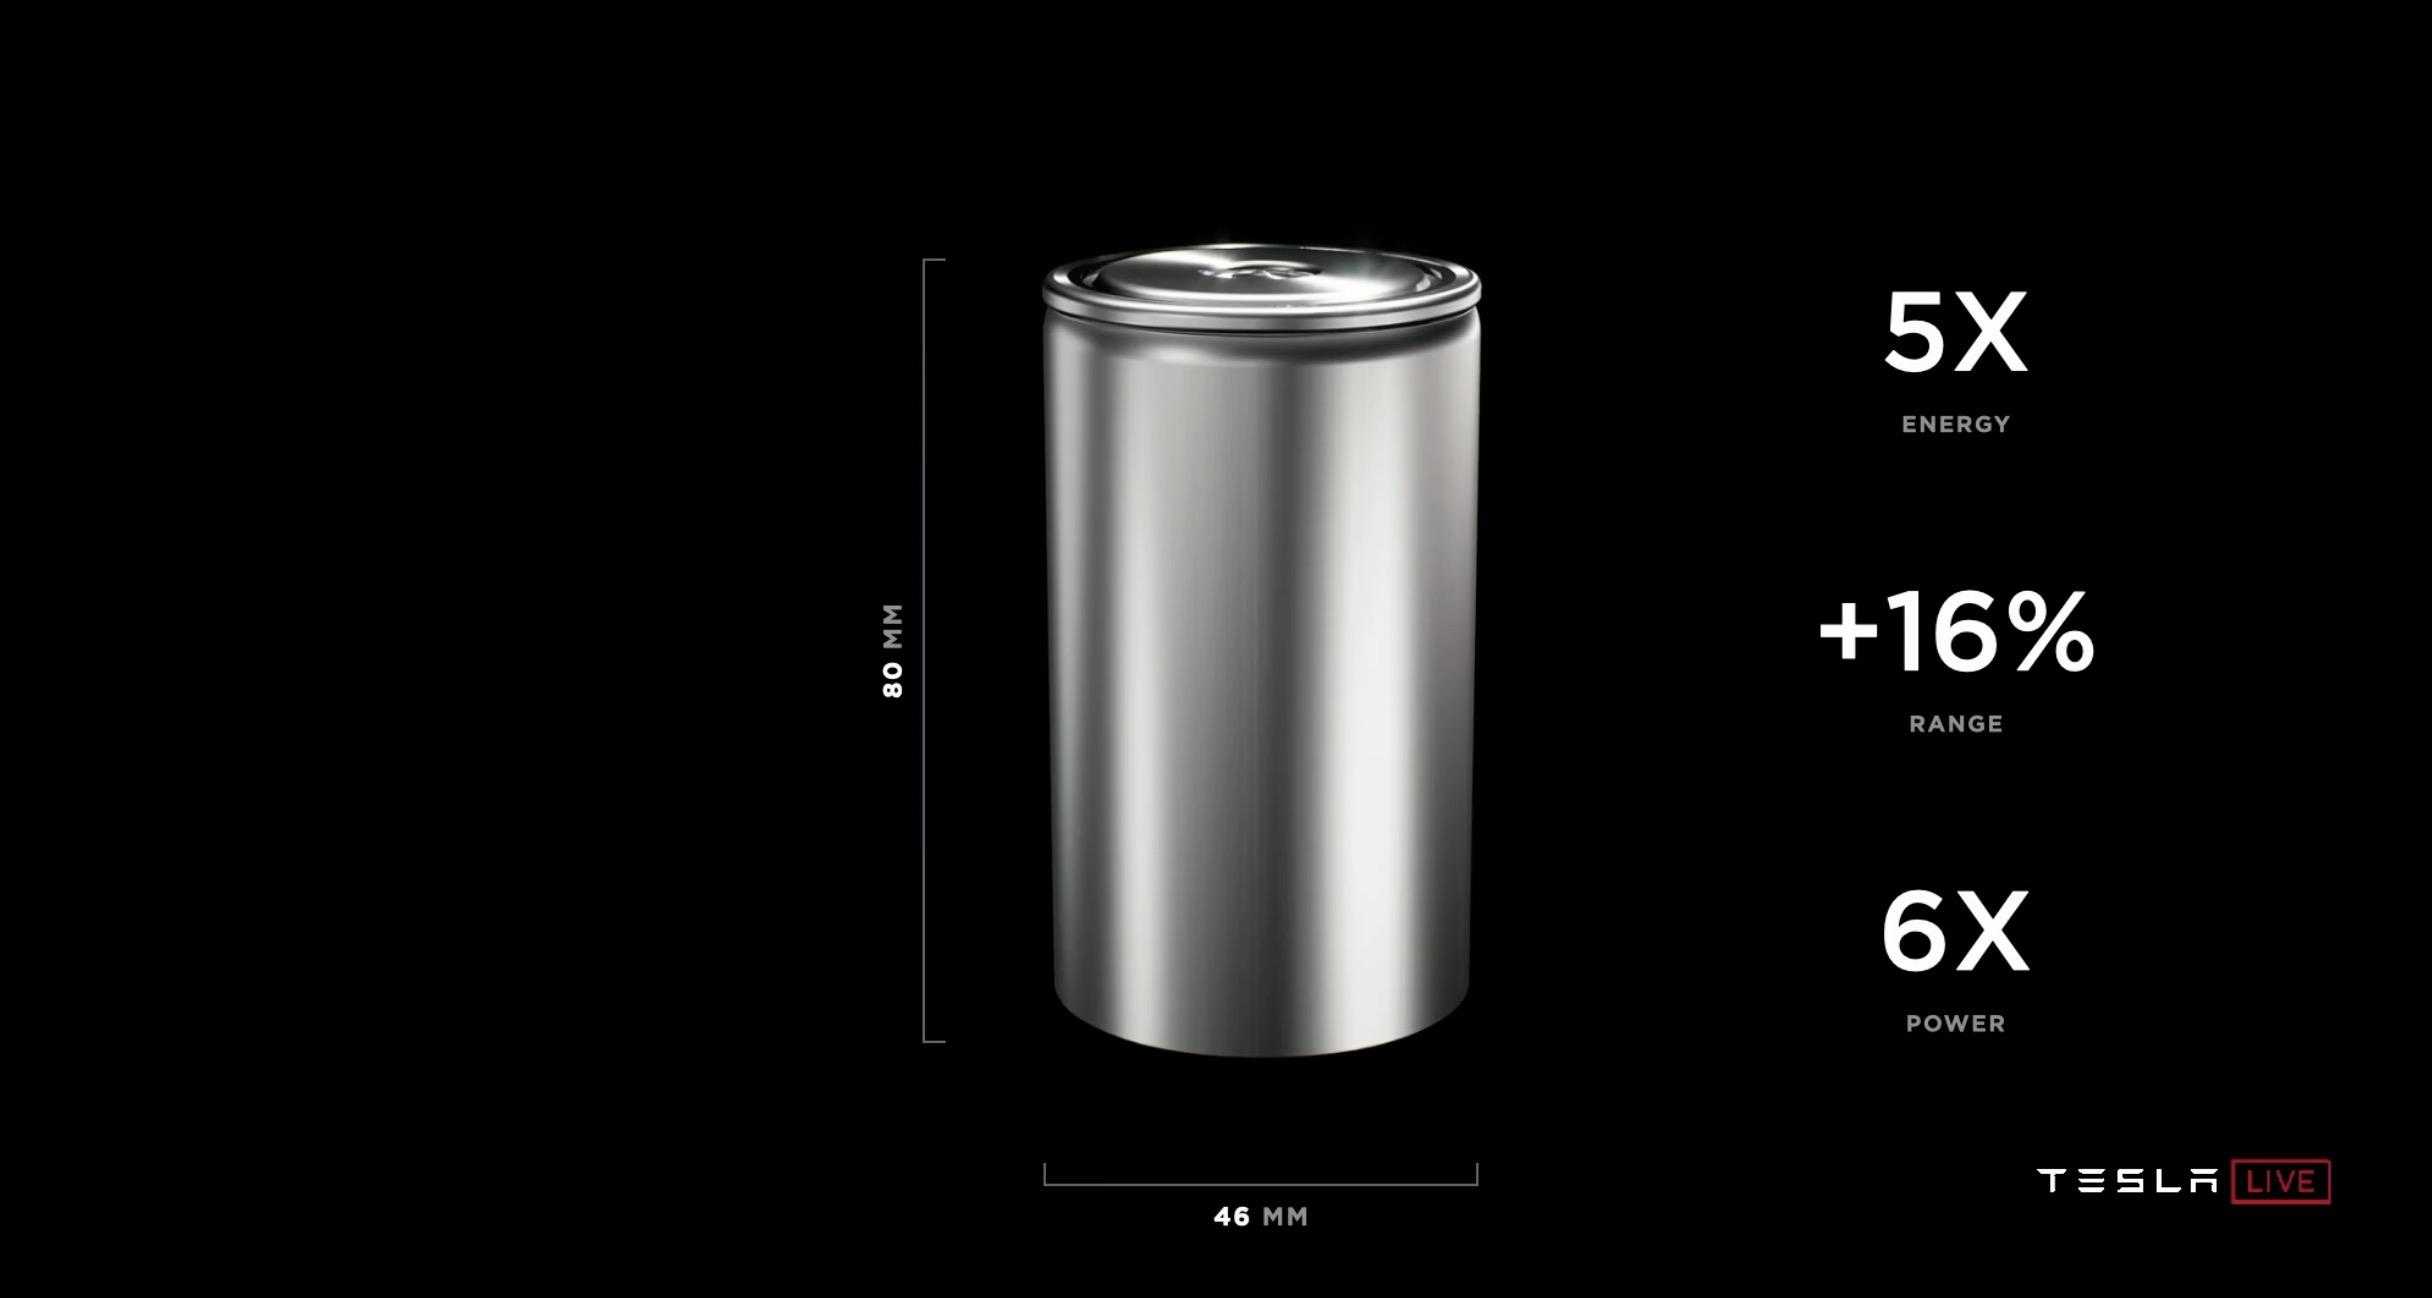 tesla battery day - photo #17